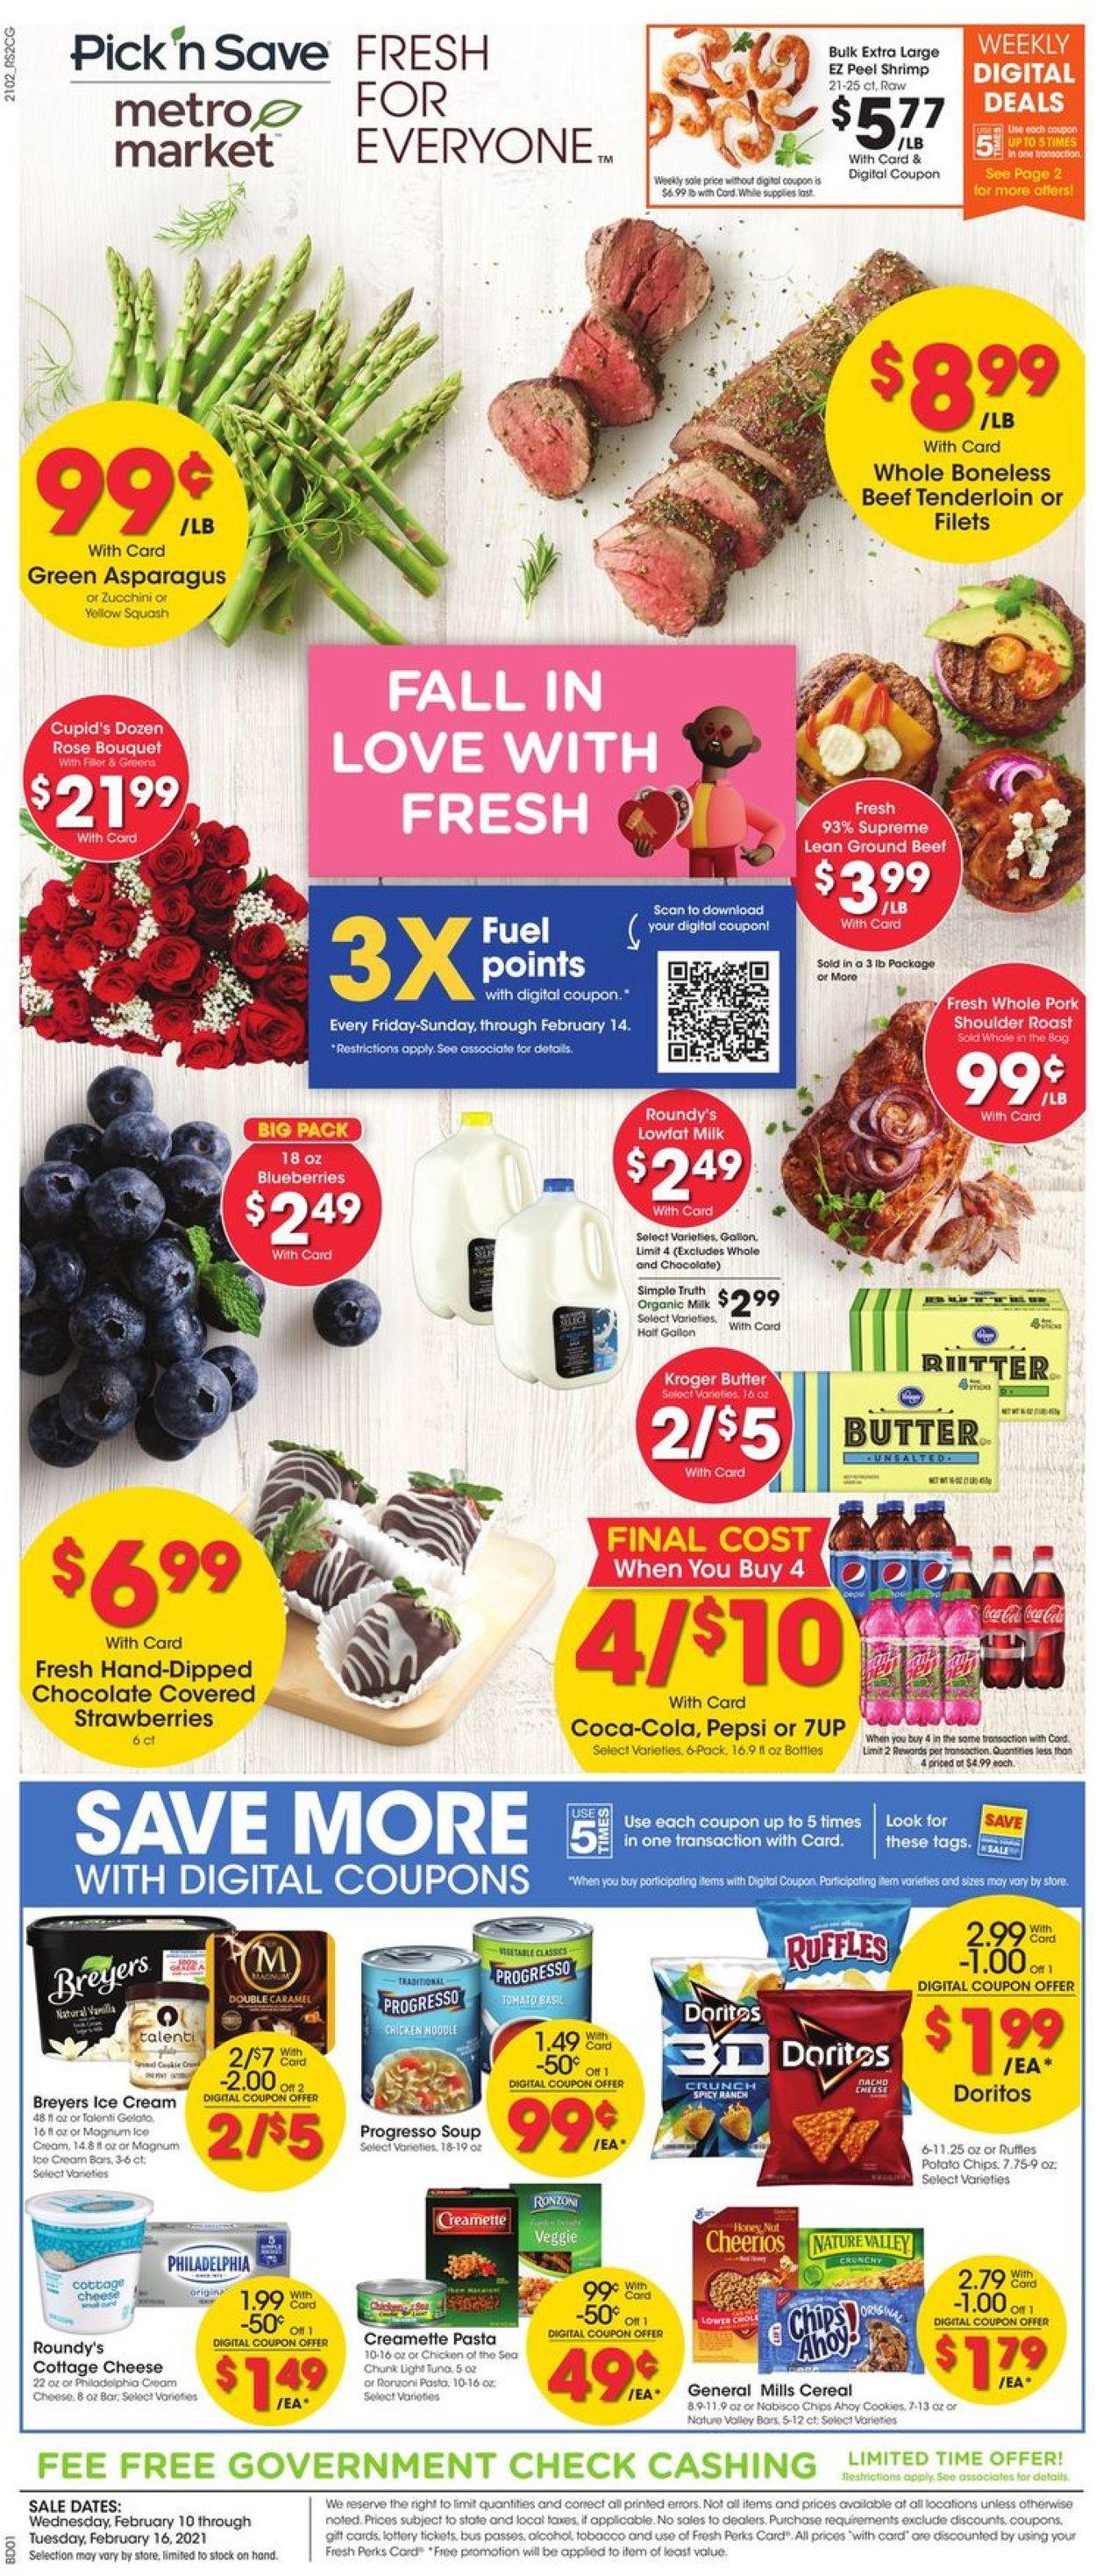 Metro Market Weekly Ad Circular - valid 02/10-02/16/2021